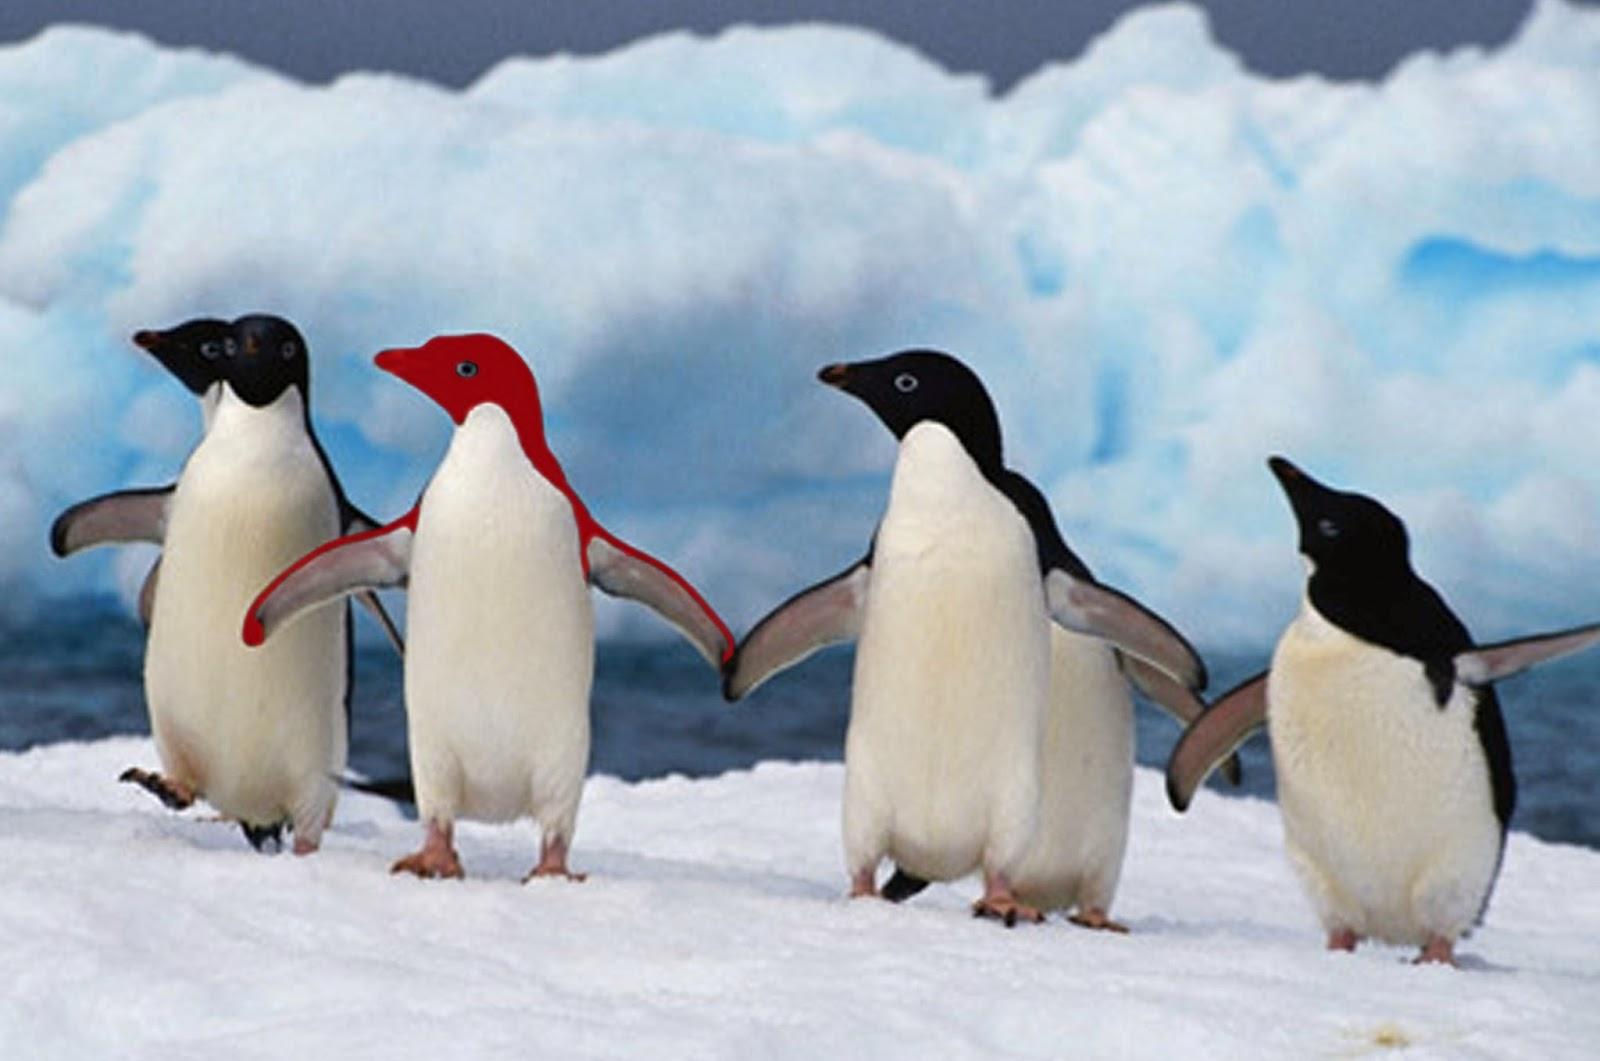 Cartoon penguins holding hands - photo#13